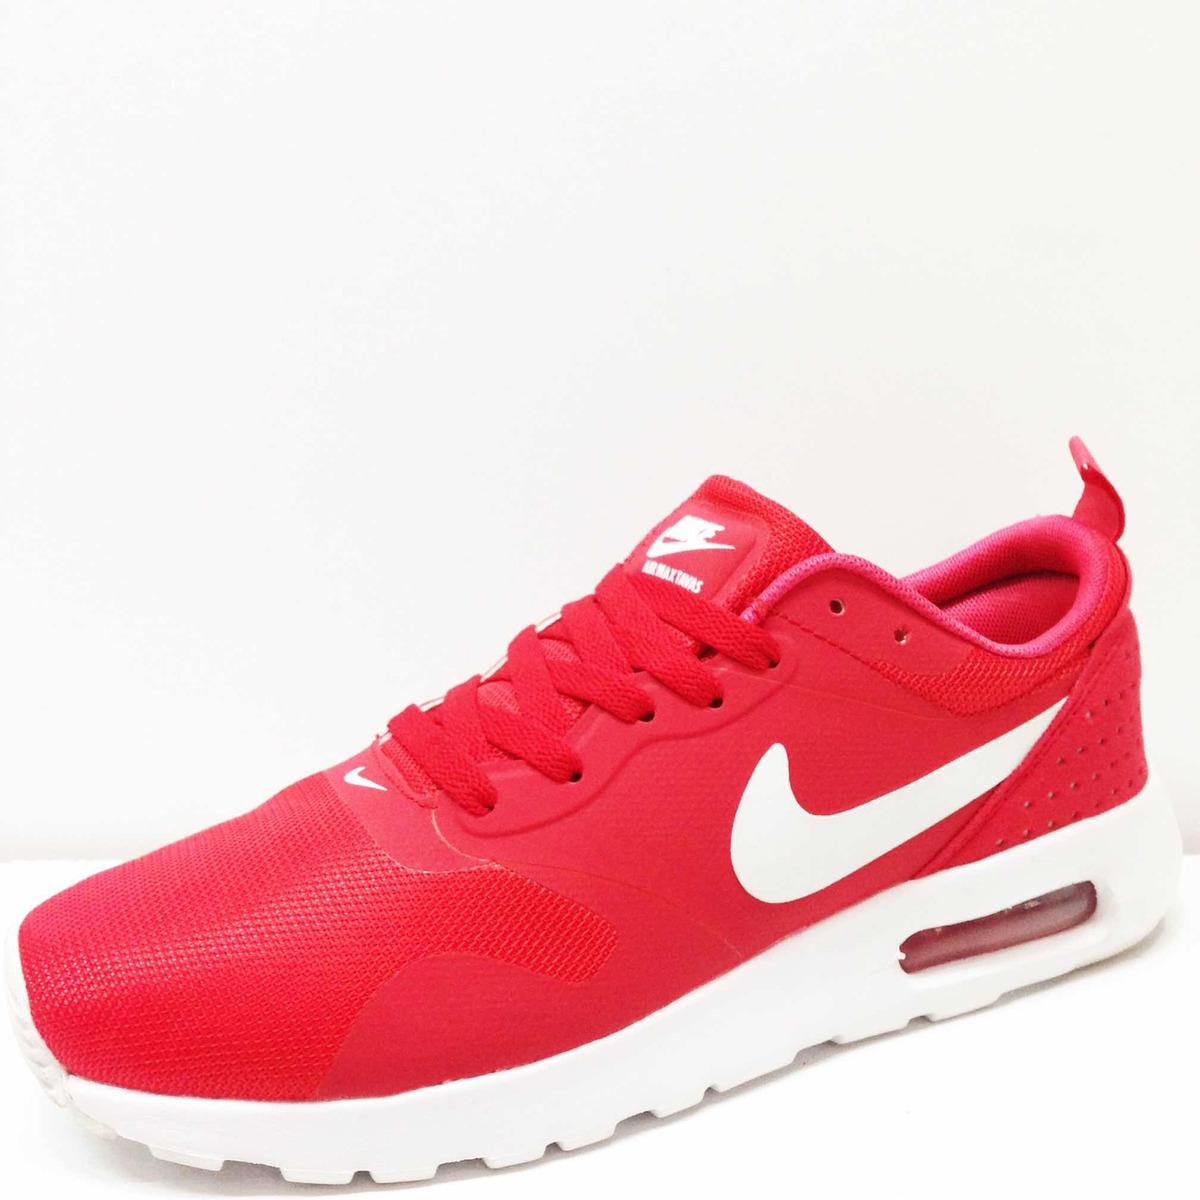 2a1e00ae1b49e Zapatos Nike Air Max Tavas 90 Caballeros Zoom Bingo Hi - Bs. 160.000 ...